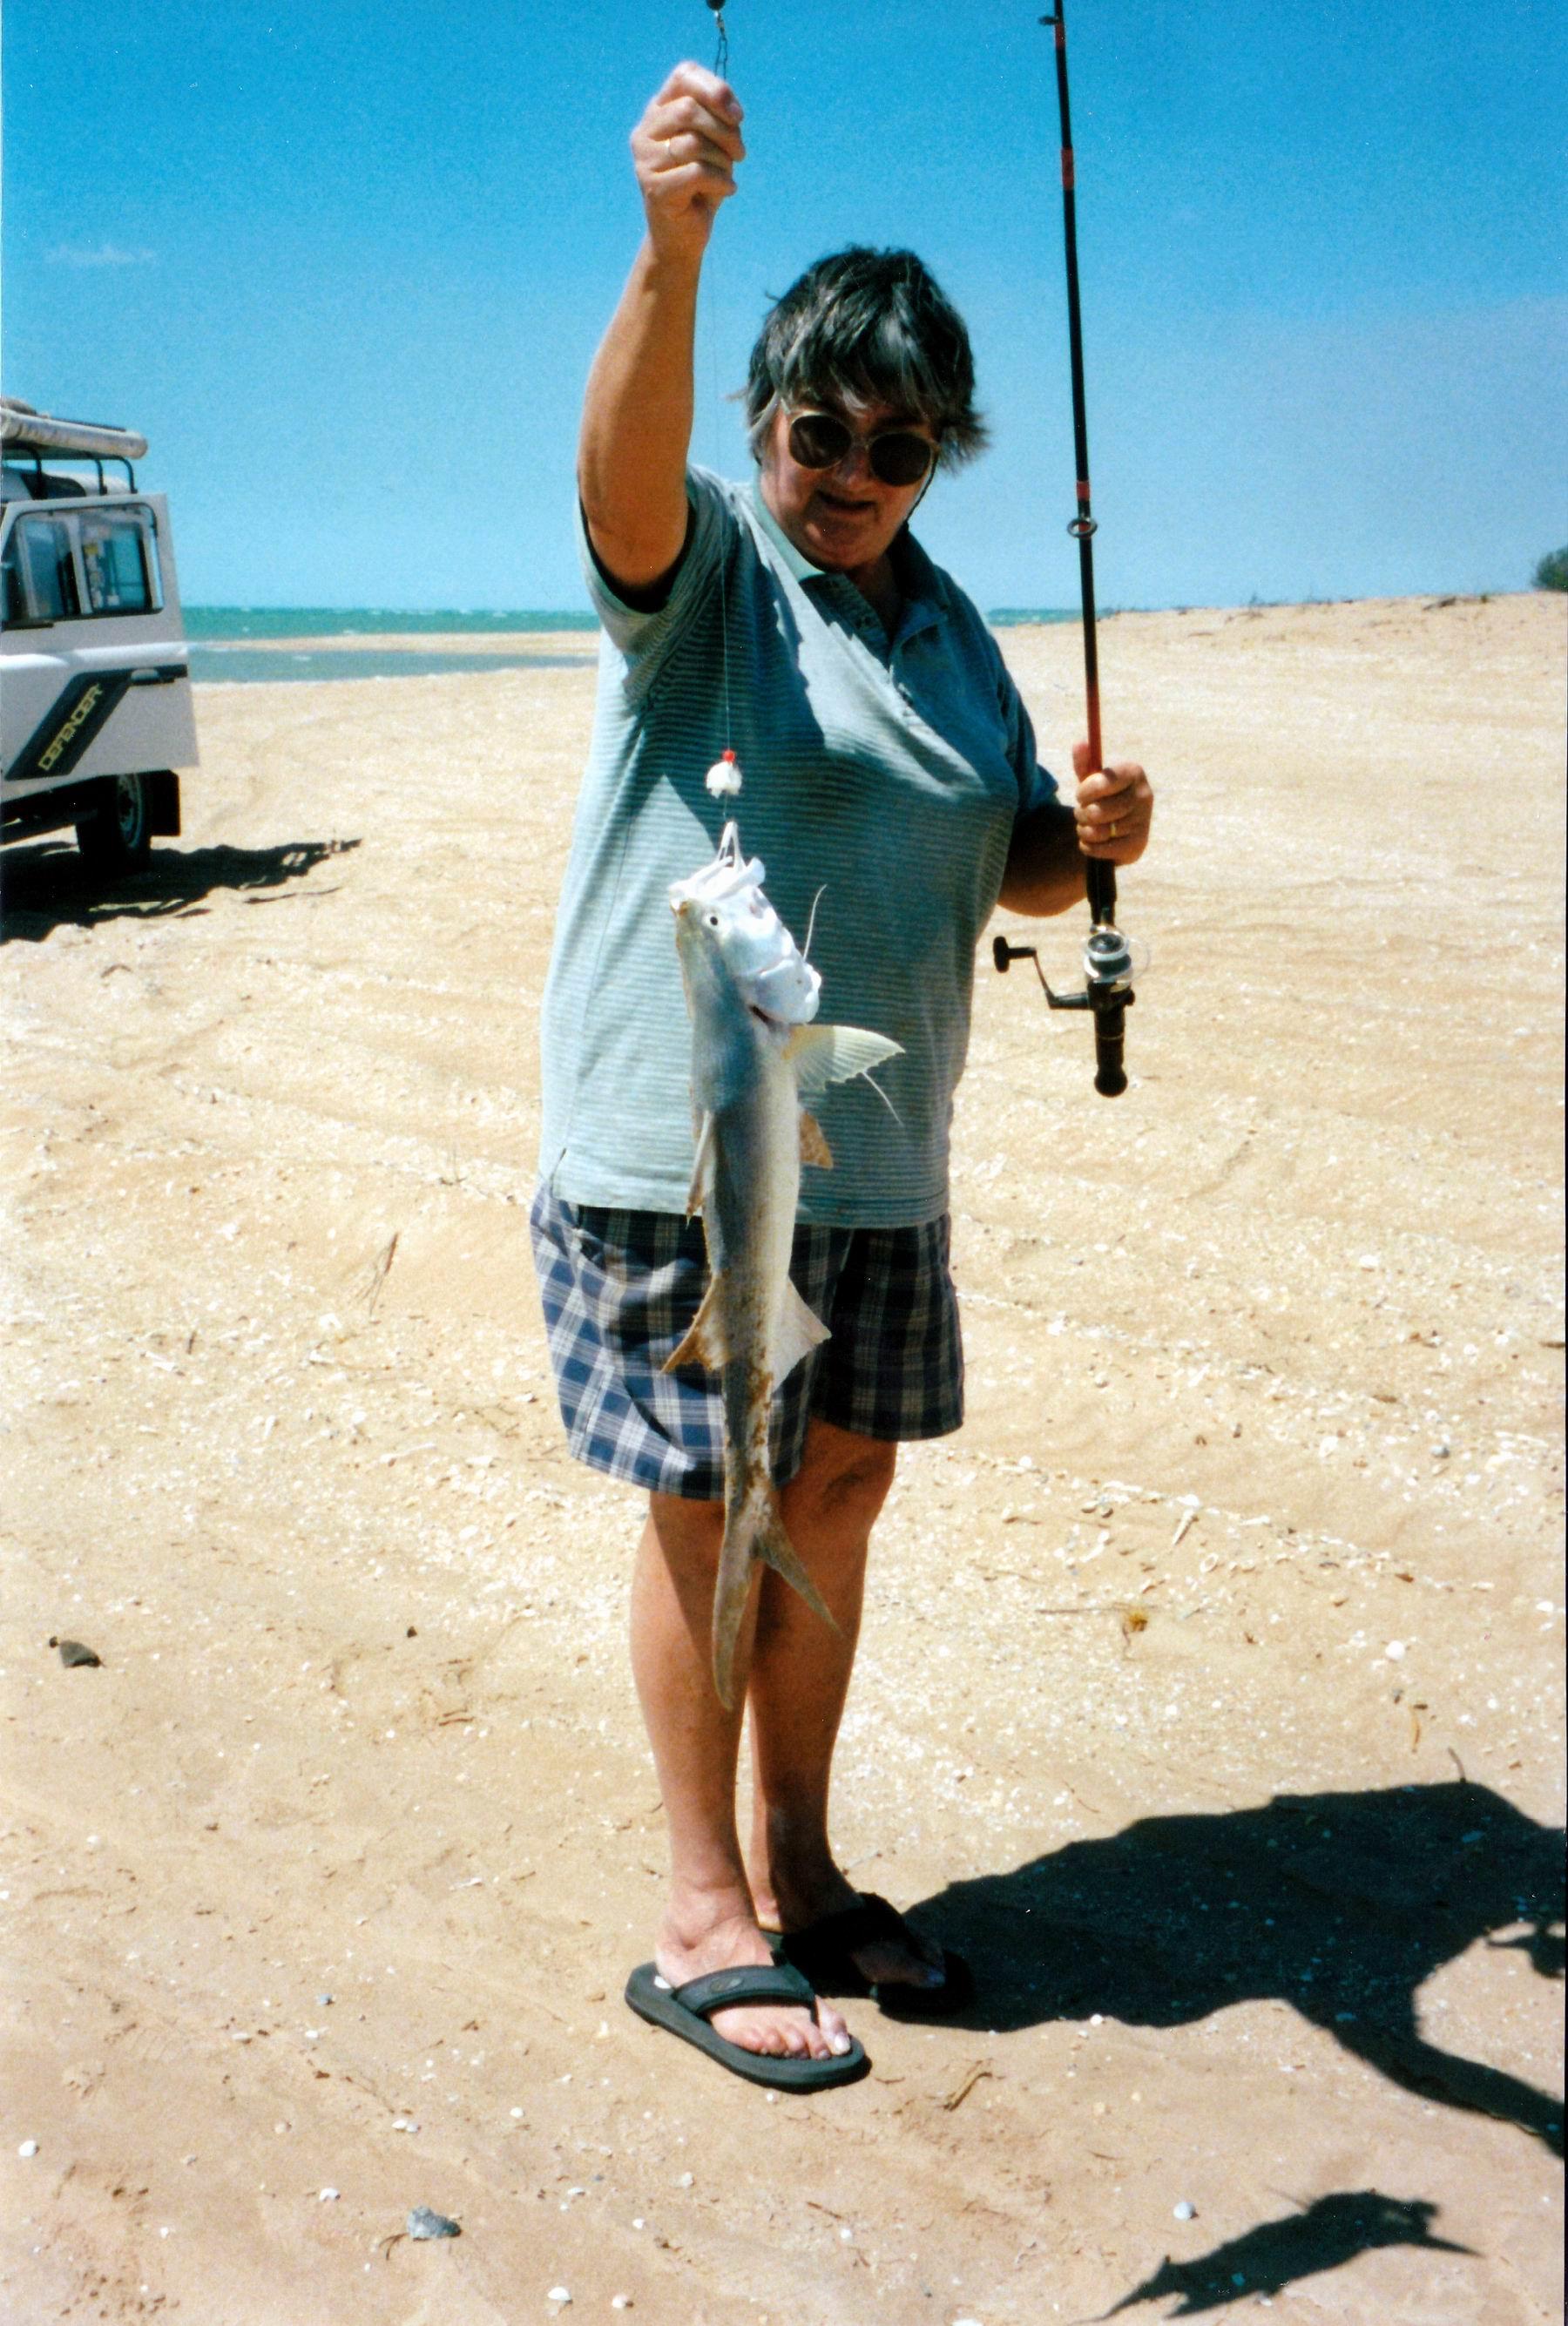 Resize of 08-24-2002 07 threadfin salmon.jpg